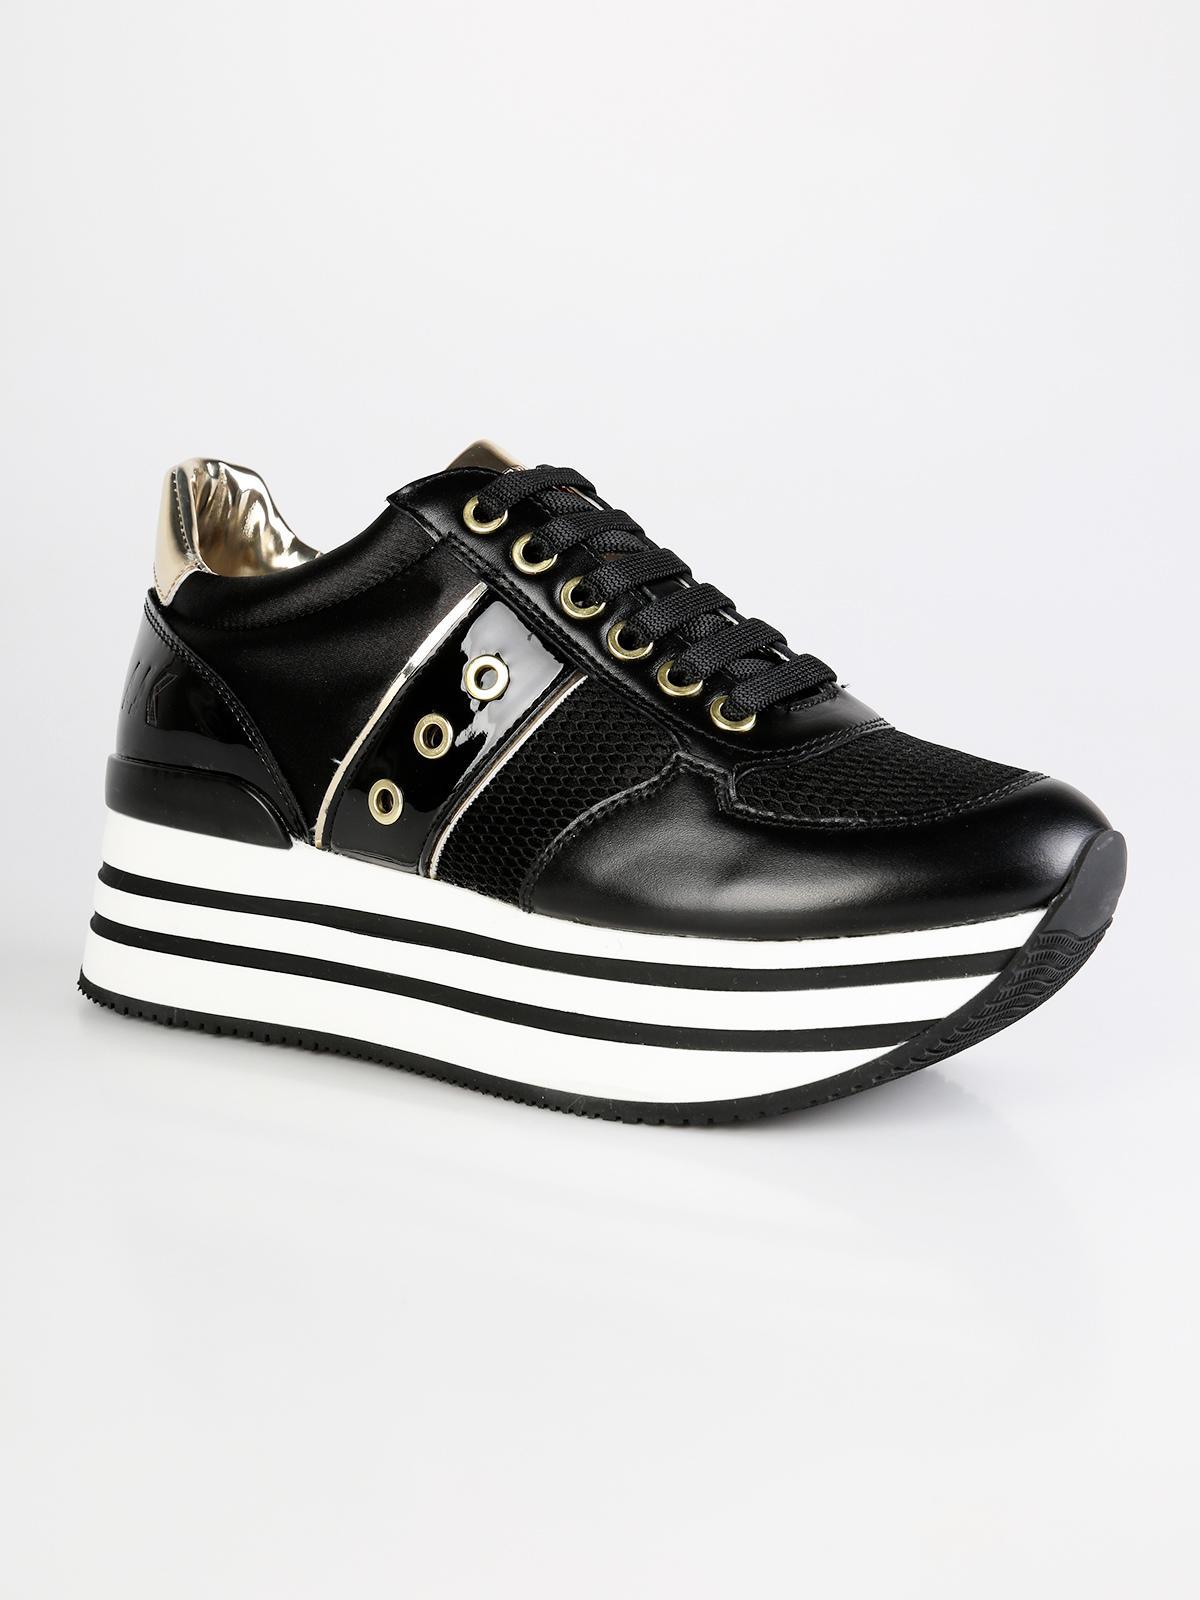 LumberjackMecshopping Nere Suola Alta Sneakers Con qpUzMVS